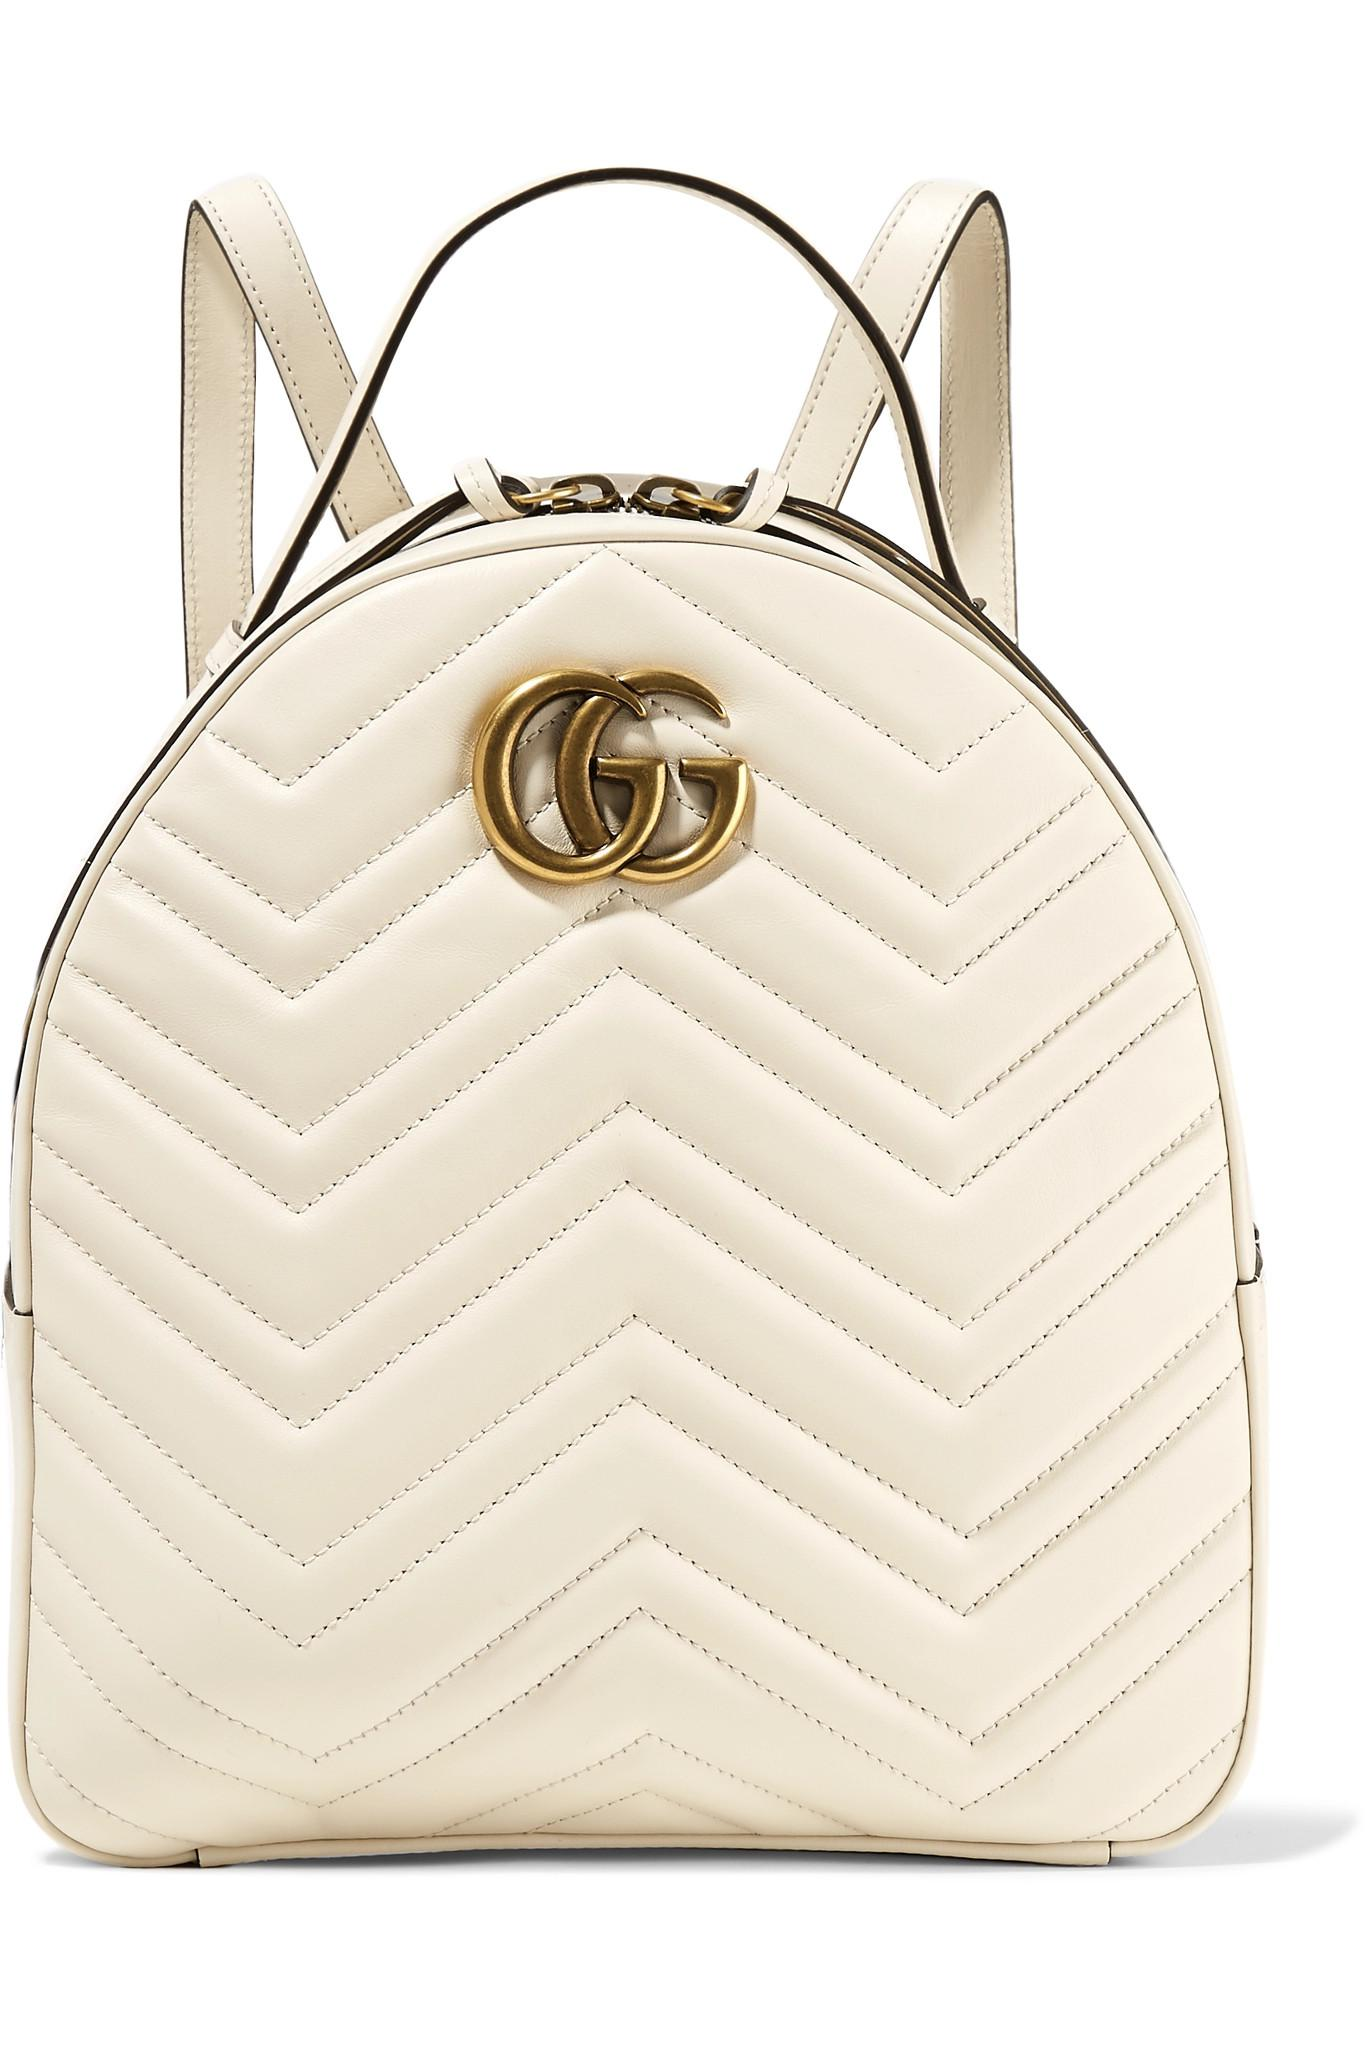 3b78b81568 Lyst - Sac À Dos En Cuir Matelassé Gg Marmont Gucci en coloris Blanc